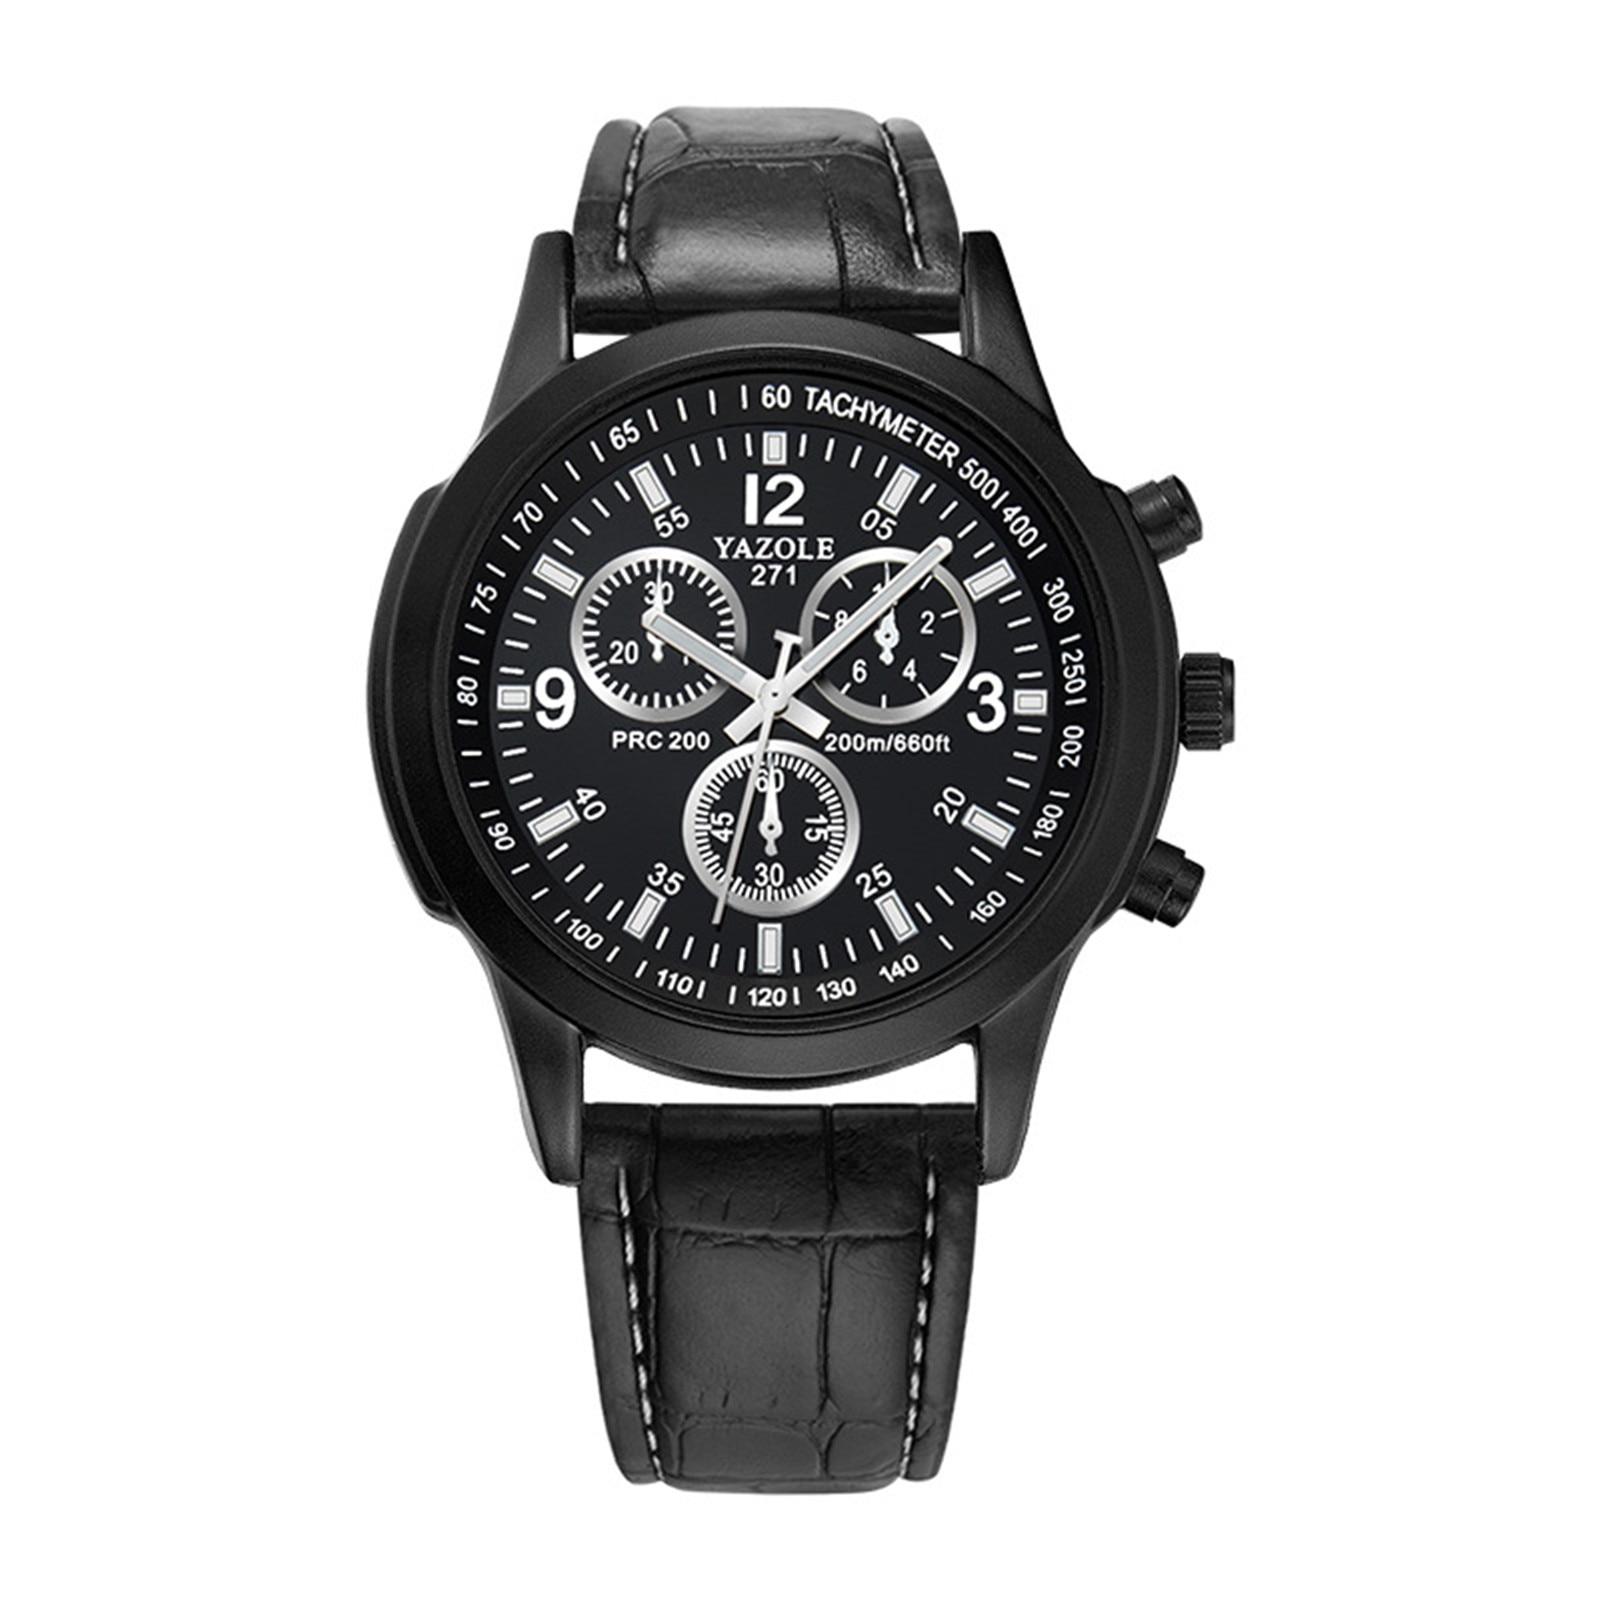 New Blu-ray Roman Numerals Watch Men Quartz Analog Wrist Watch Men's Mechanical Watch Pagani Design Quartz Wristwatches#3